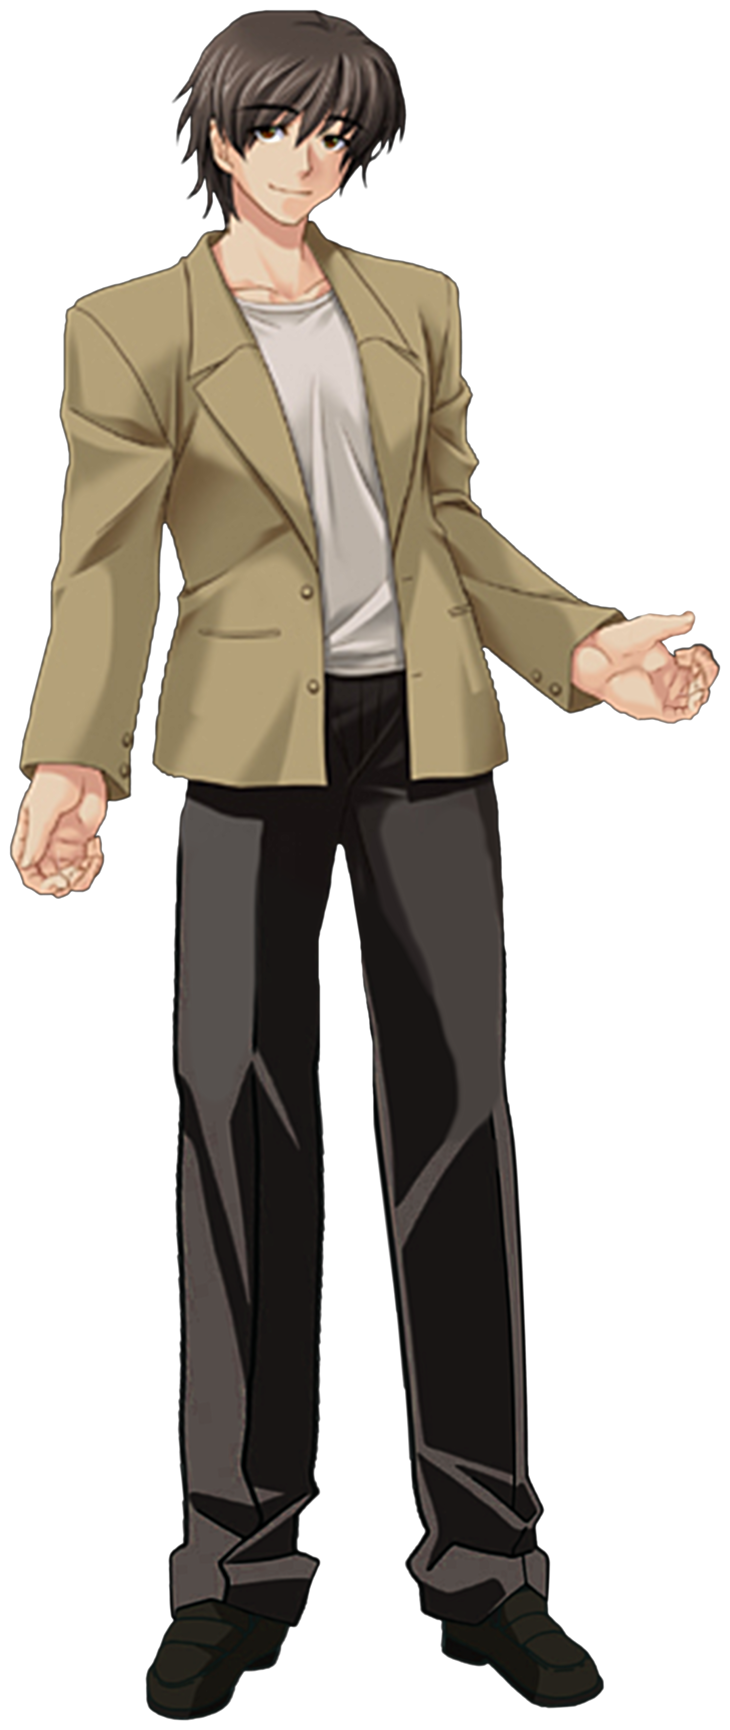 Kyousuke Sawaki